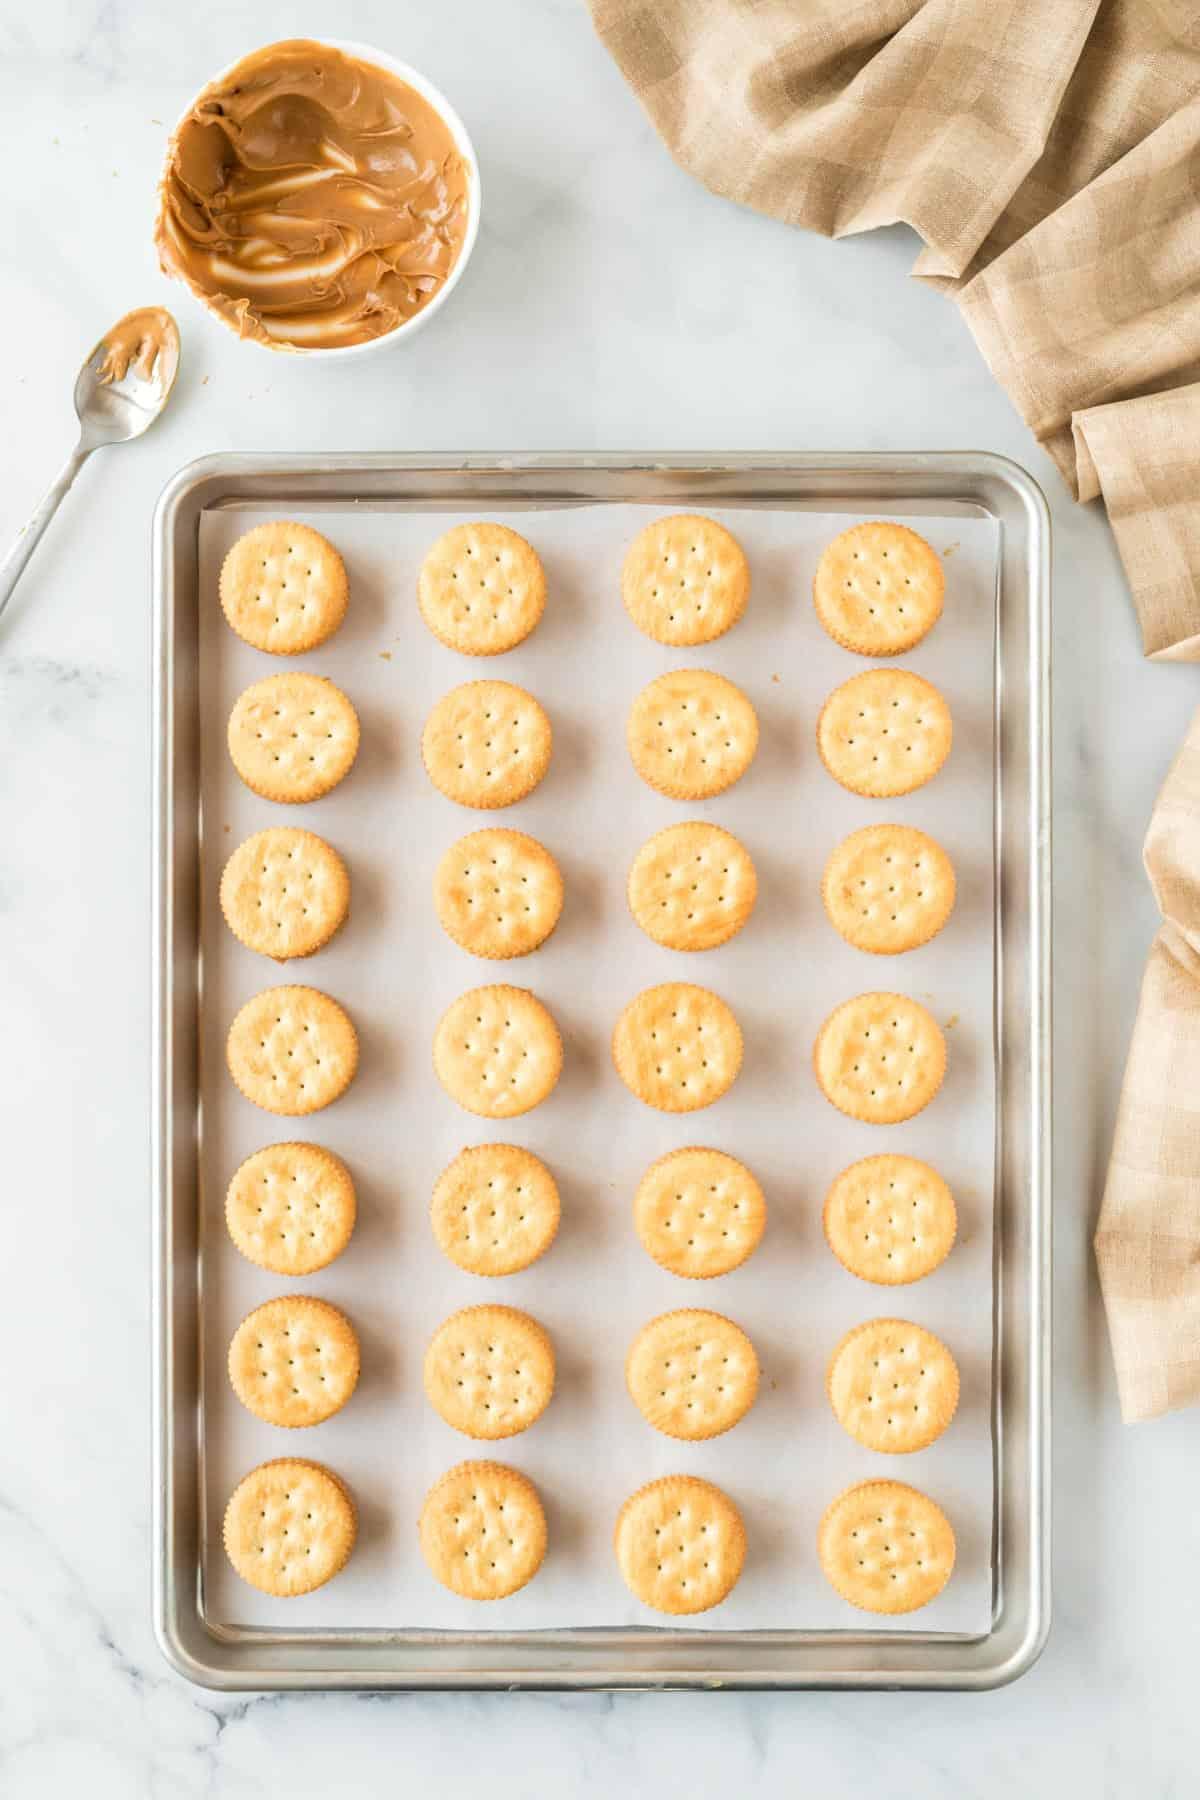 ritz cracker peanut butter sandwiches lined up on the baking sheet